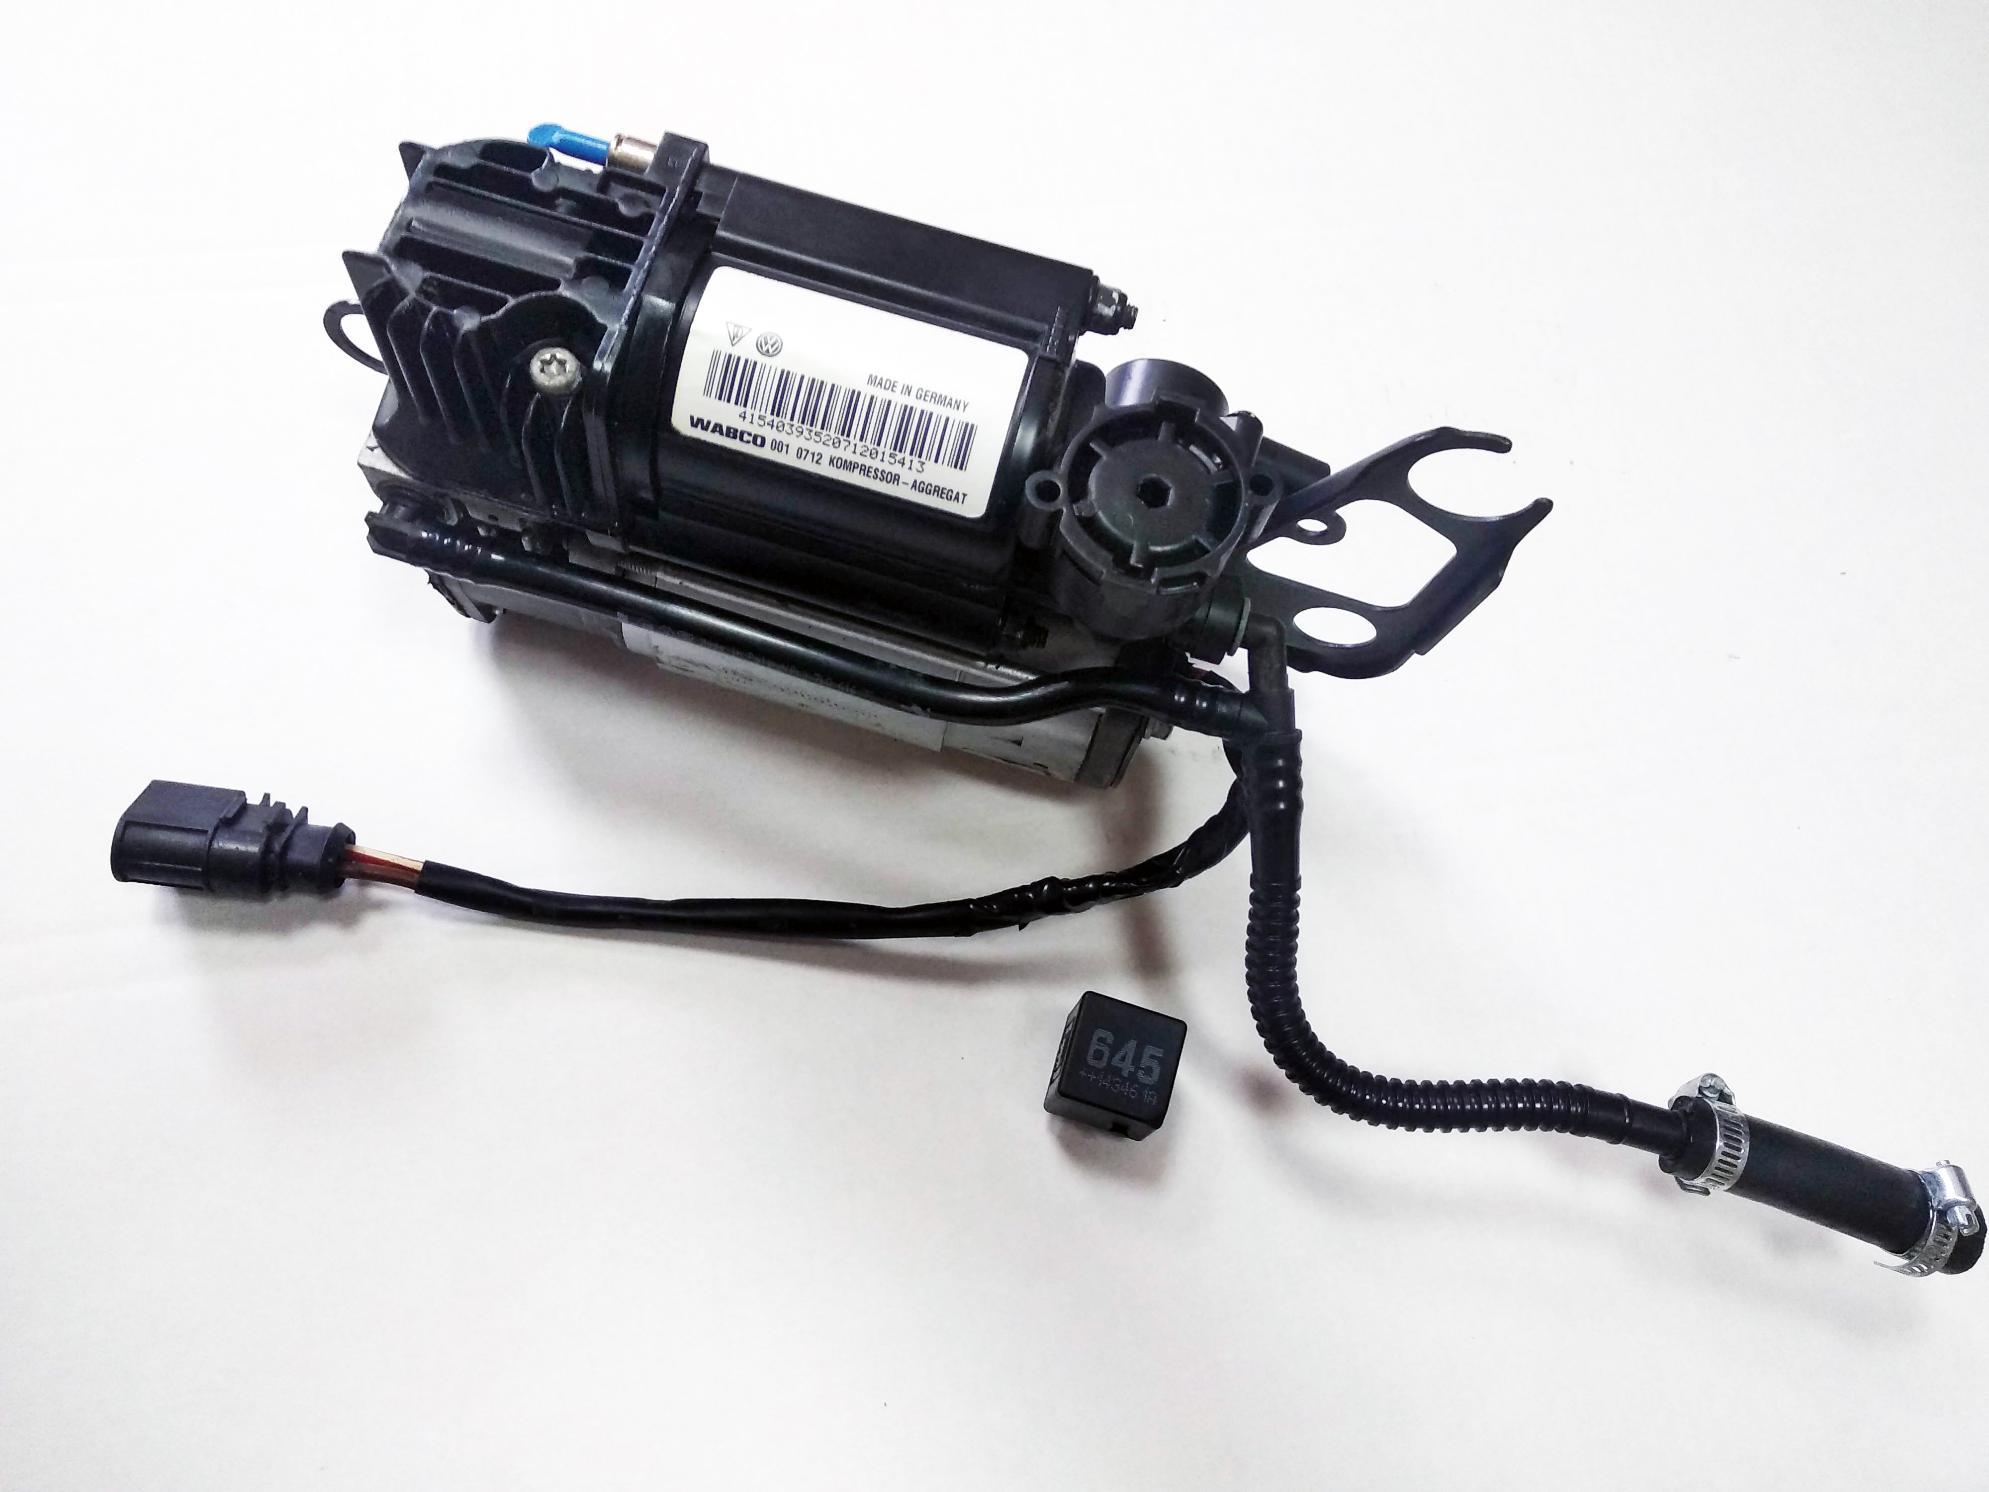 картинка Оригинальный восстановленный компрессор пневмоподвески VW Touareg I GP, Porsche Cayenne I 955/957, Audi Q7 4L (4L0698007) от магазина пневмоподвески ПневмоМаркет